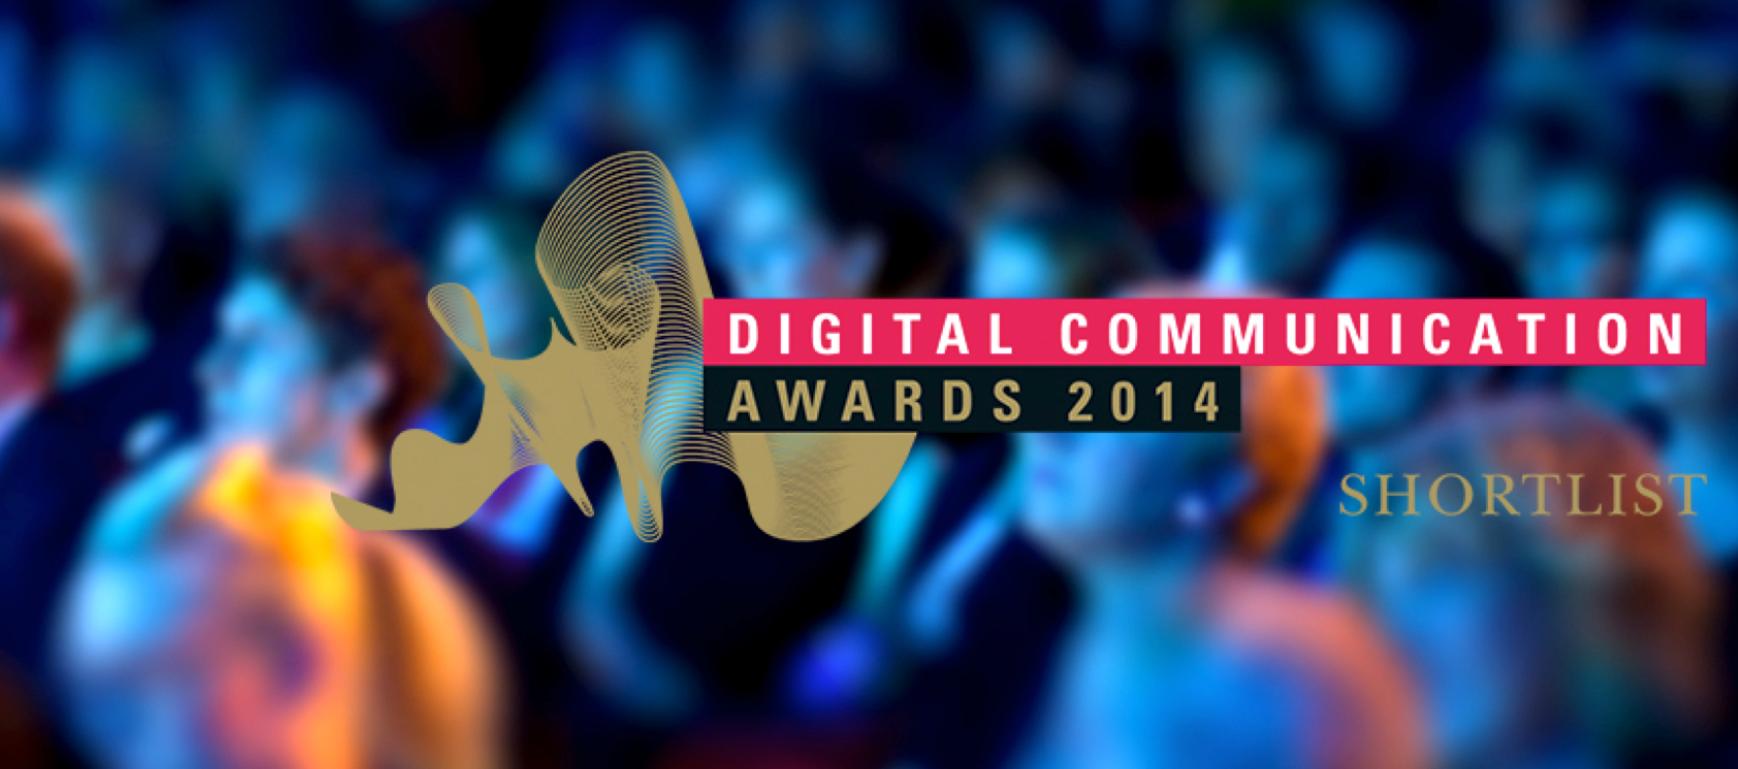 Digital Communication Award